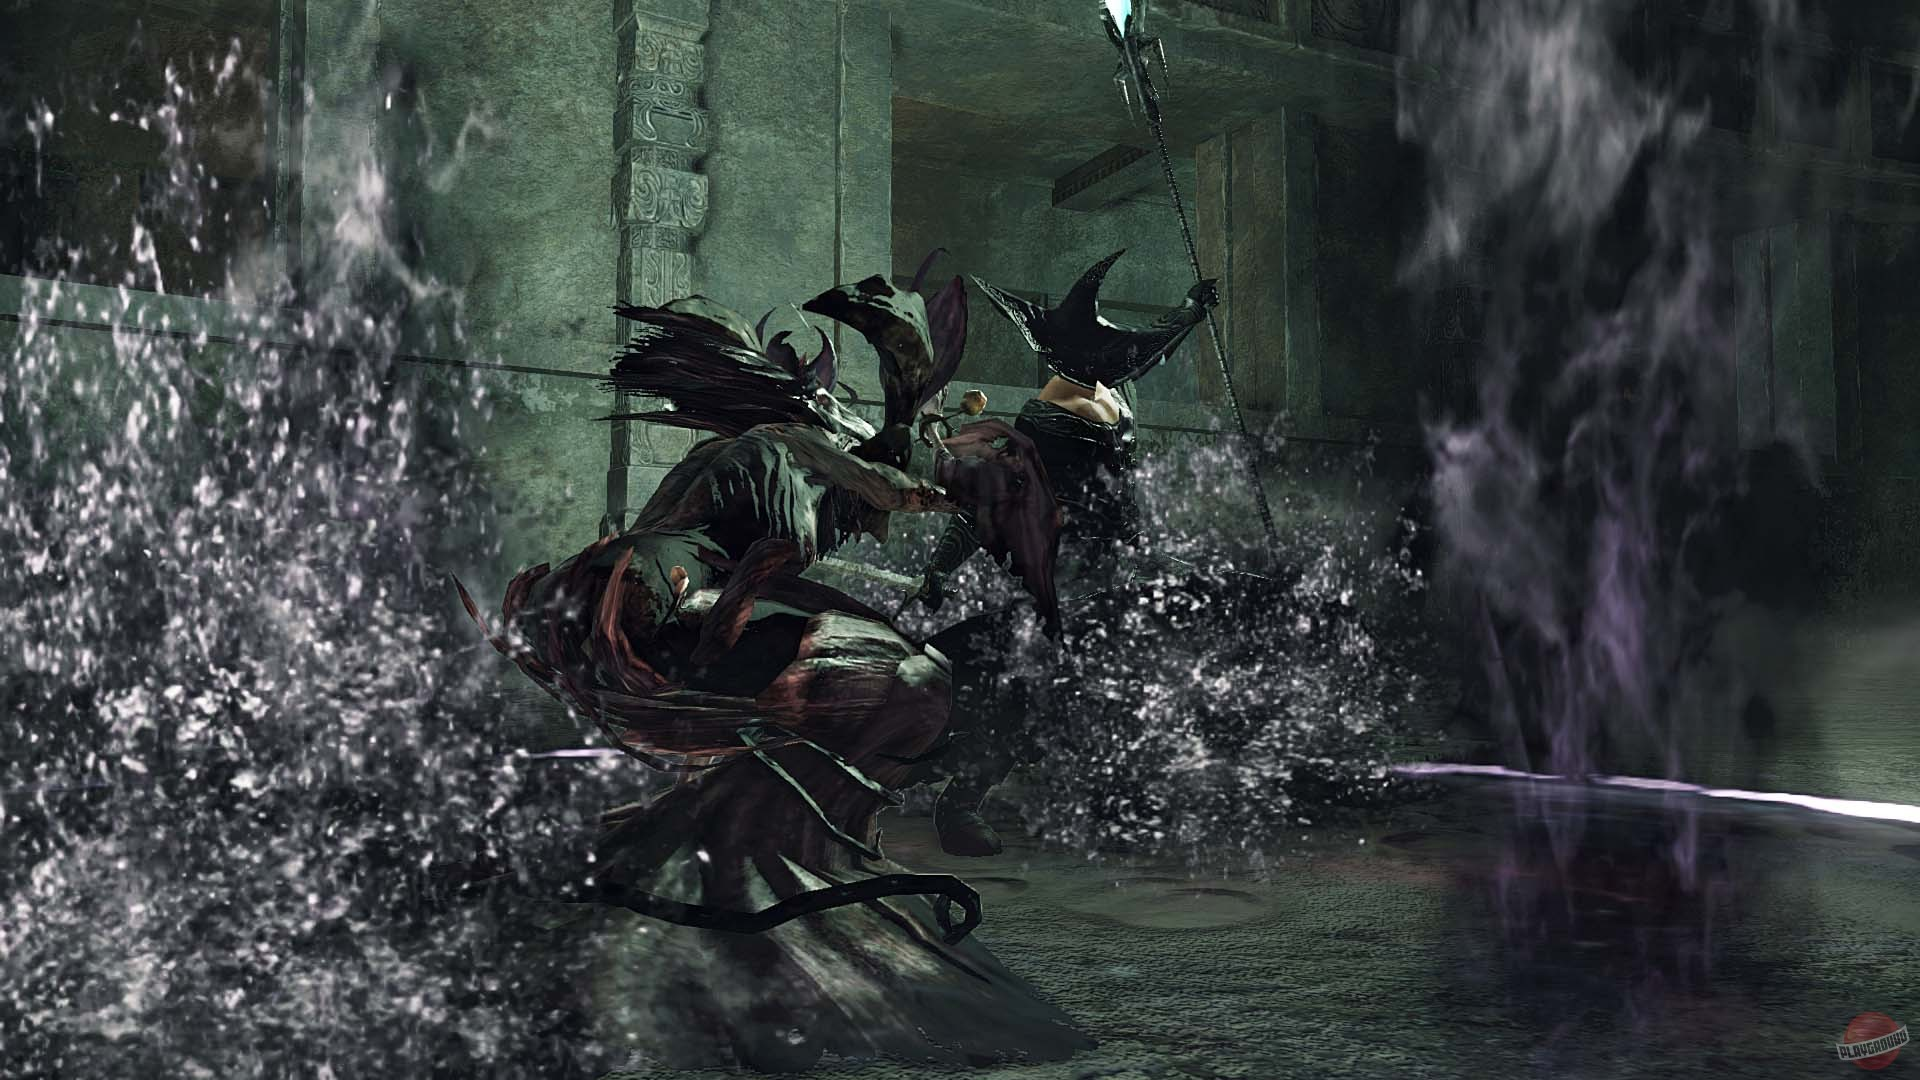 Dark souls 2 читы xbox 360 - 91